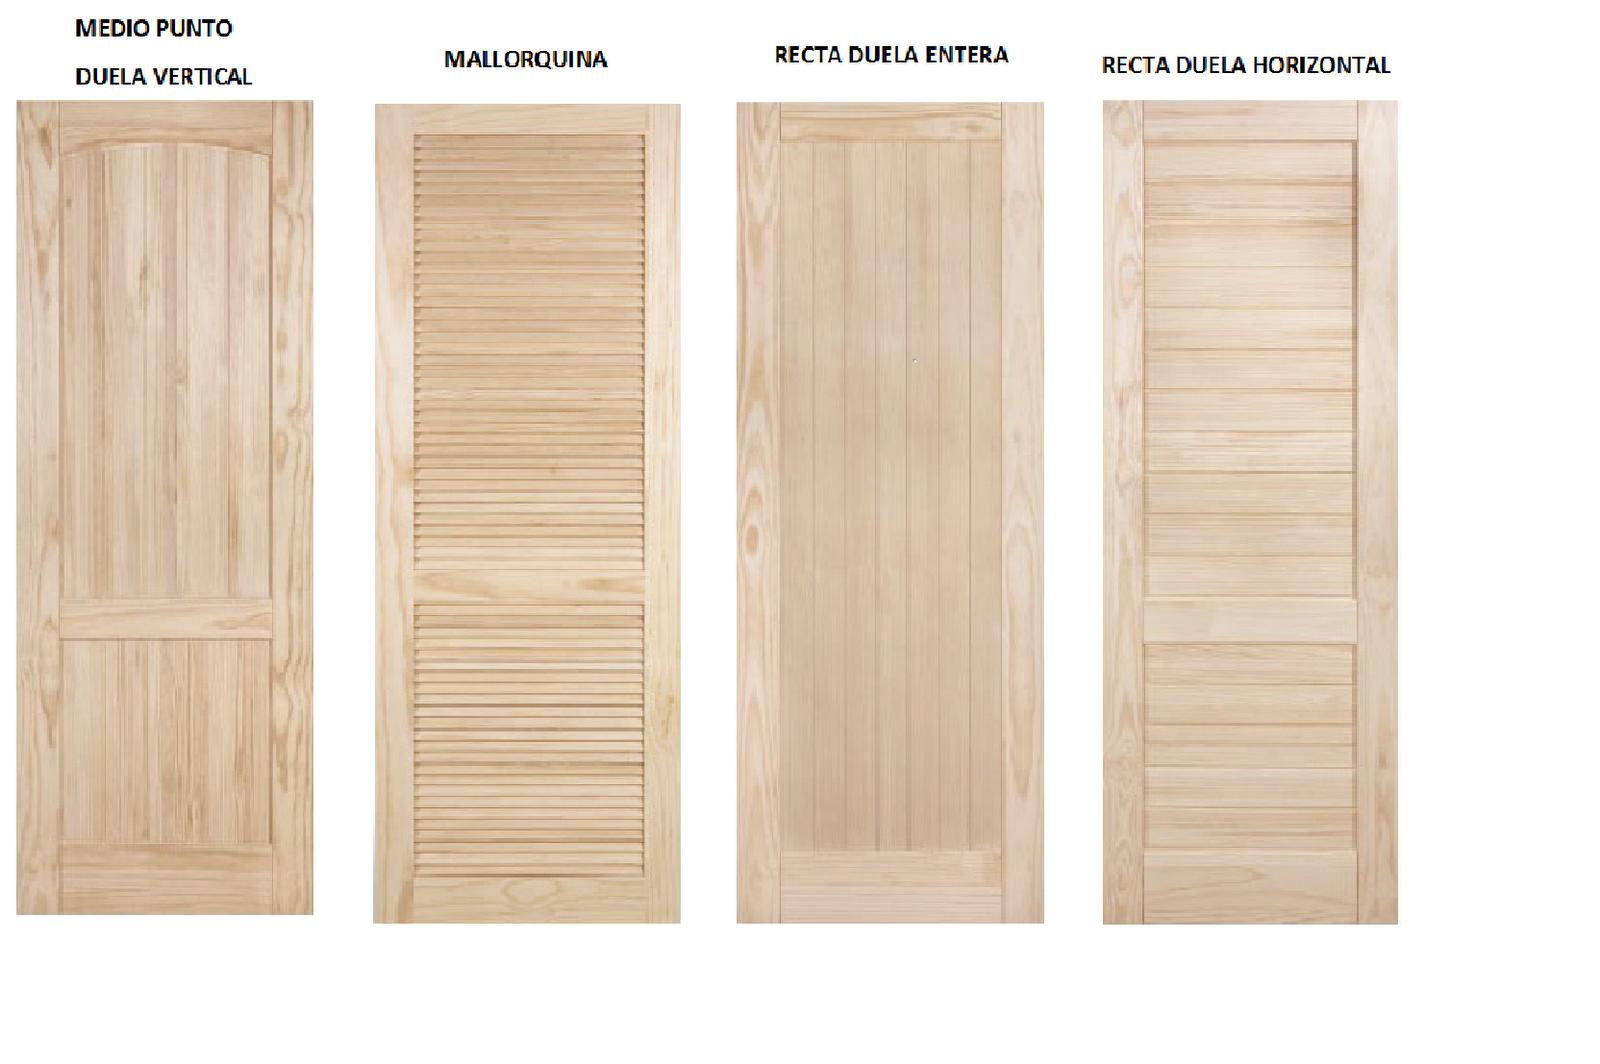 Carpinter a de madera mart n torralbo puertas for Puertas de madera en oferta